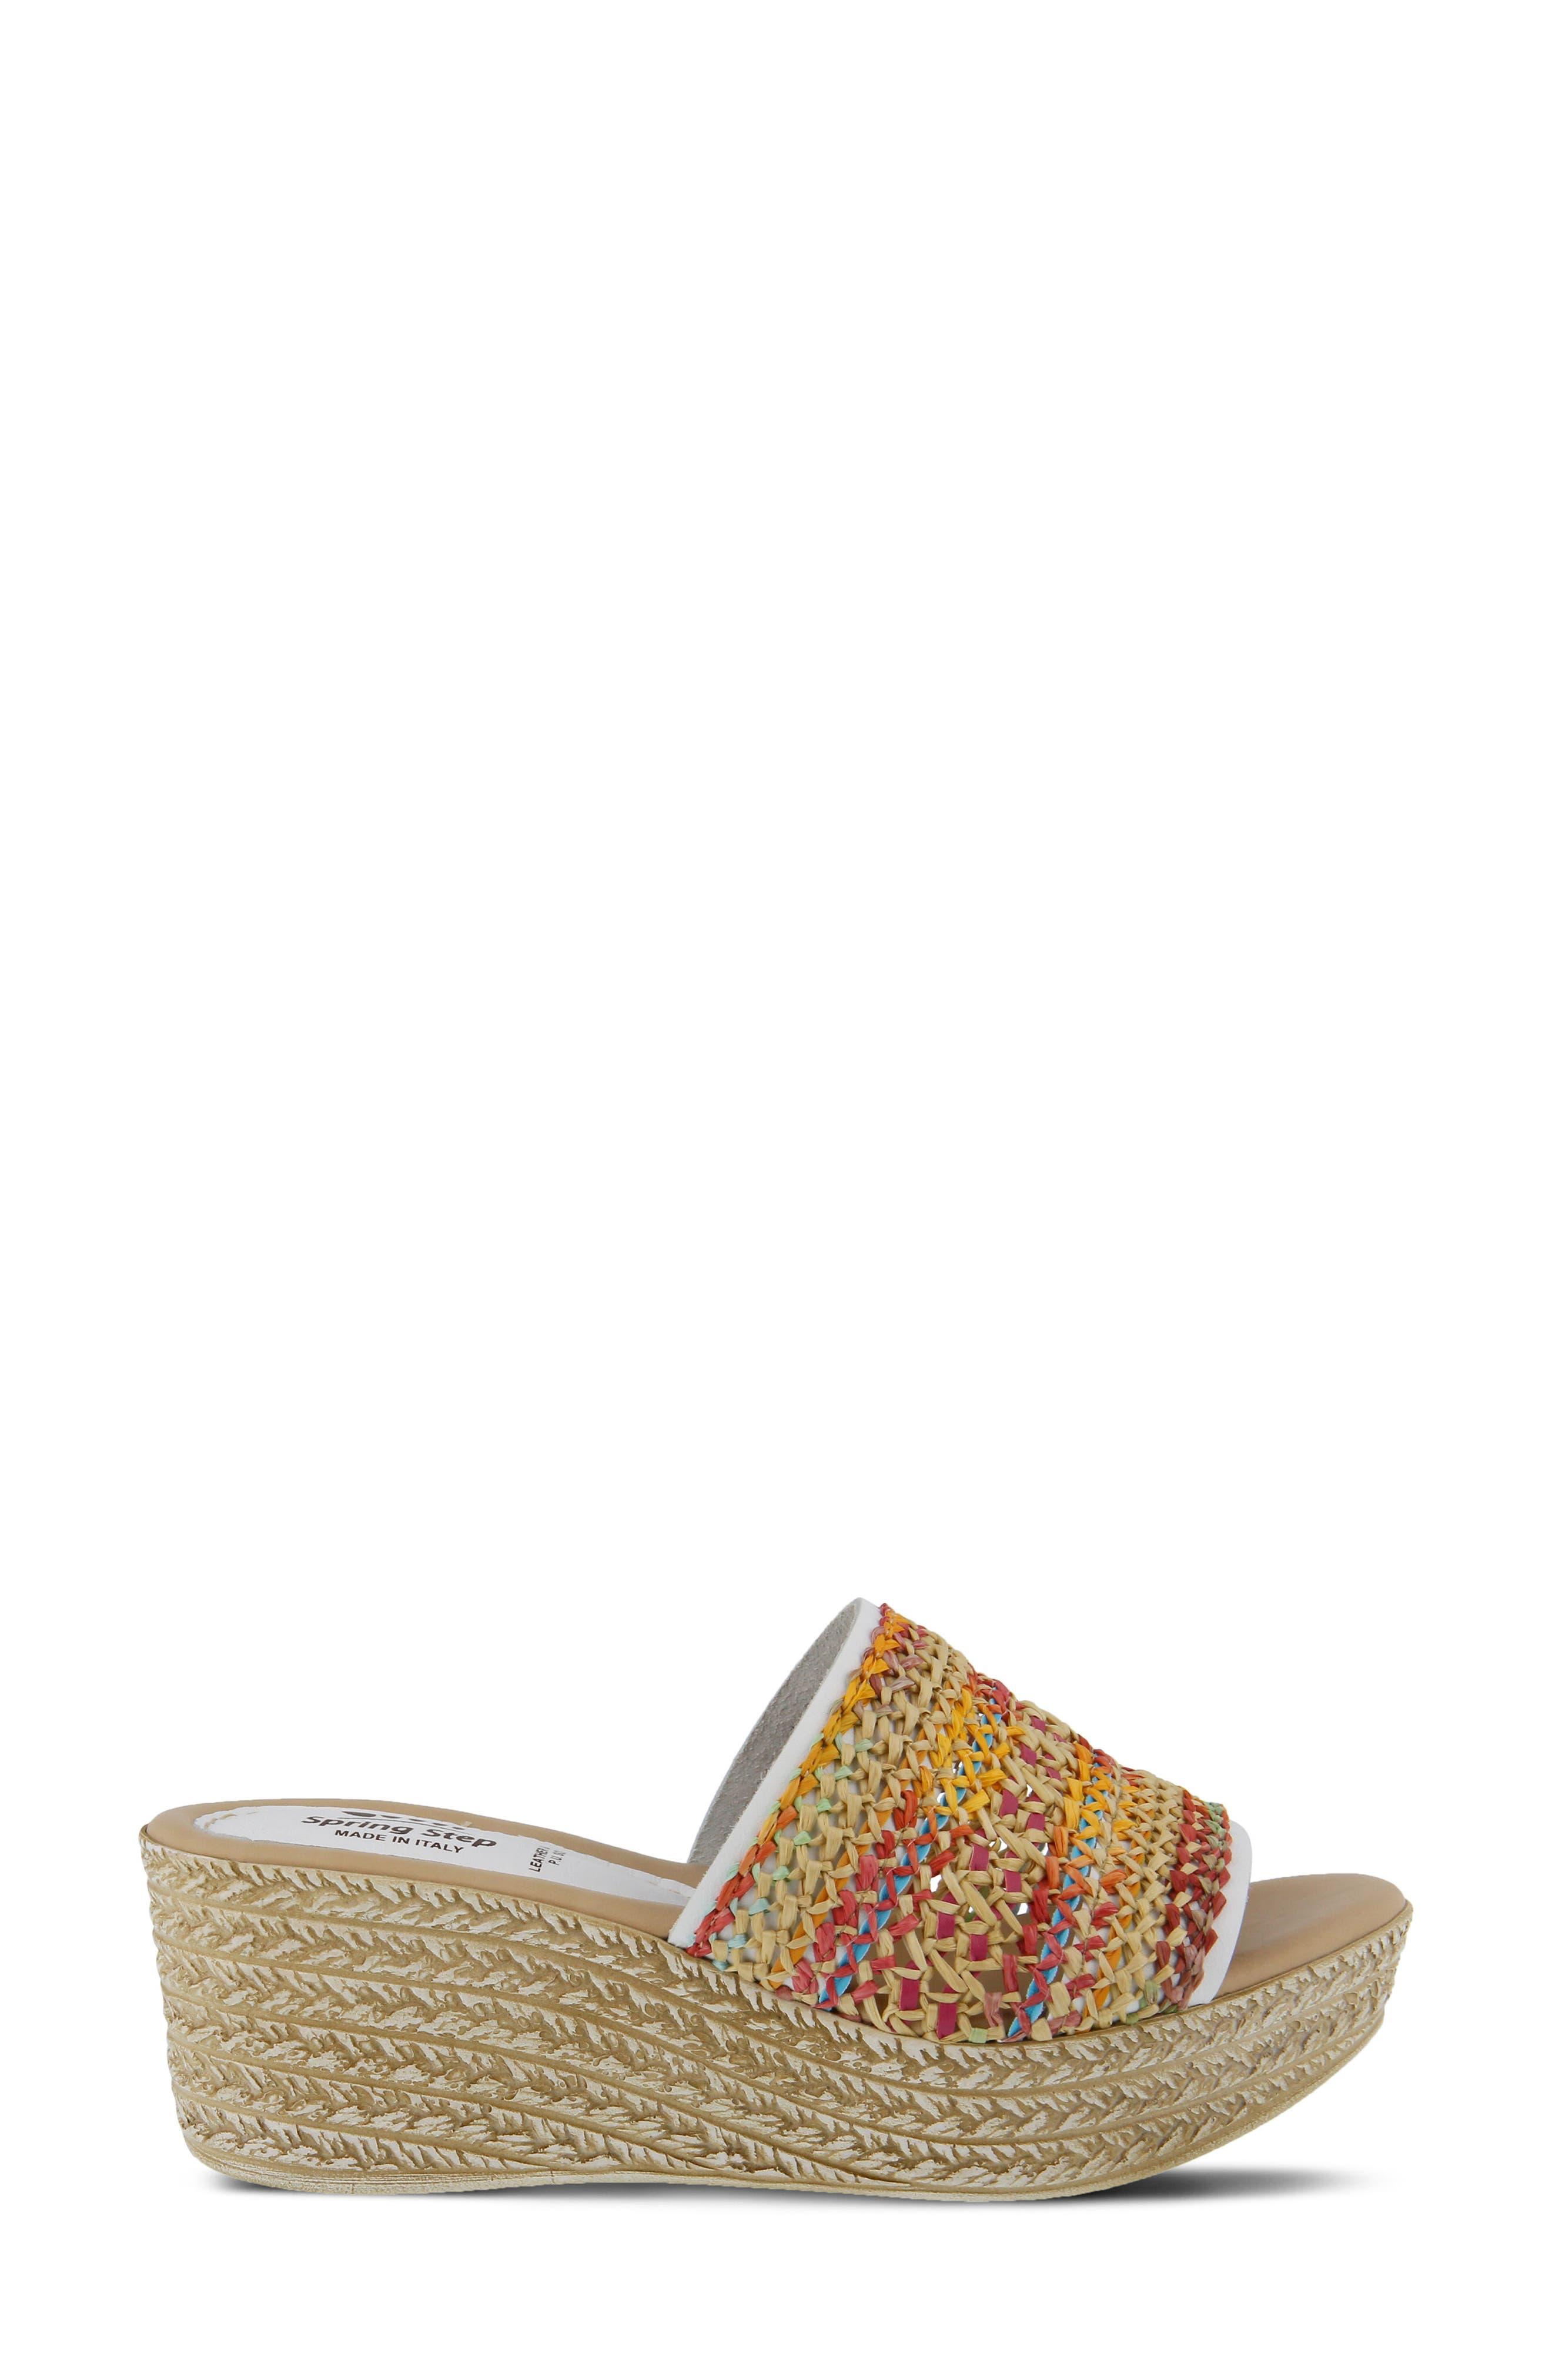 Calci Espadrille Wedge Sandal,                             Alternate thumbnail 3, color,                             White Leather